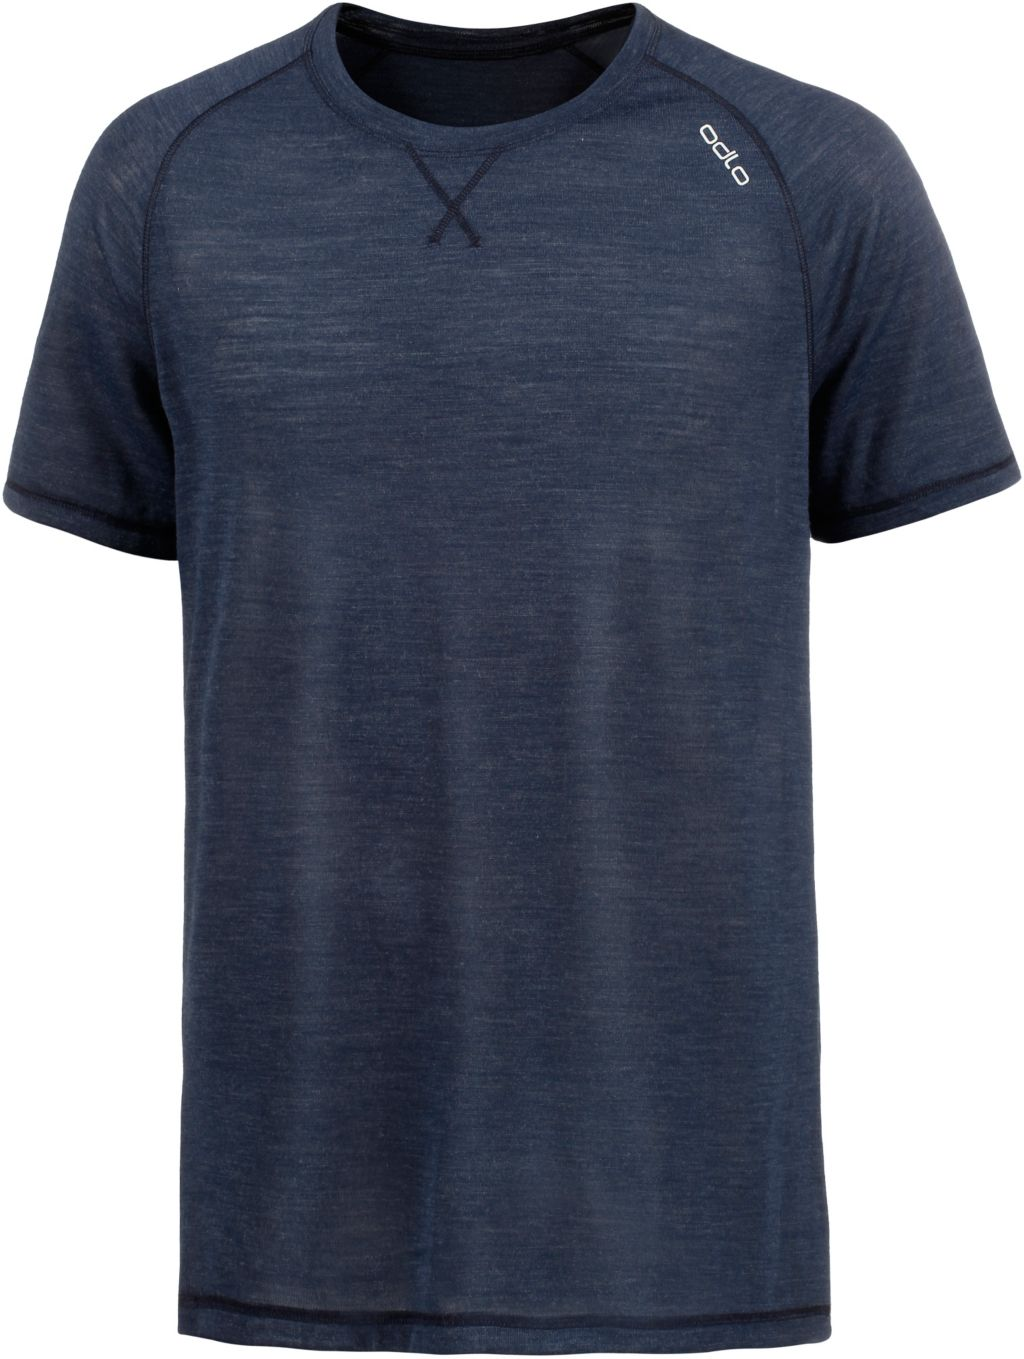 Odlo Revolution Light T-Shirt Herren in blau, Größe XL